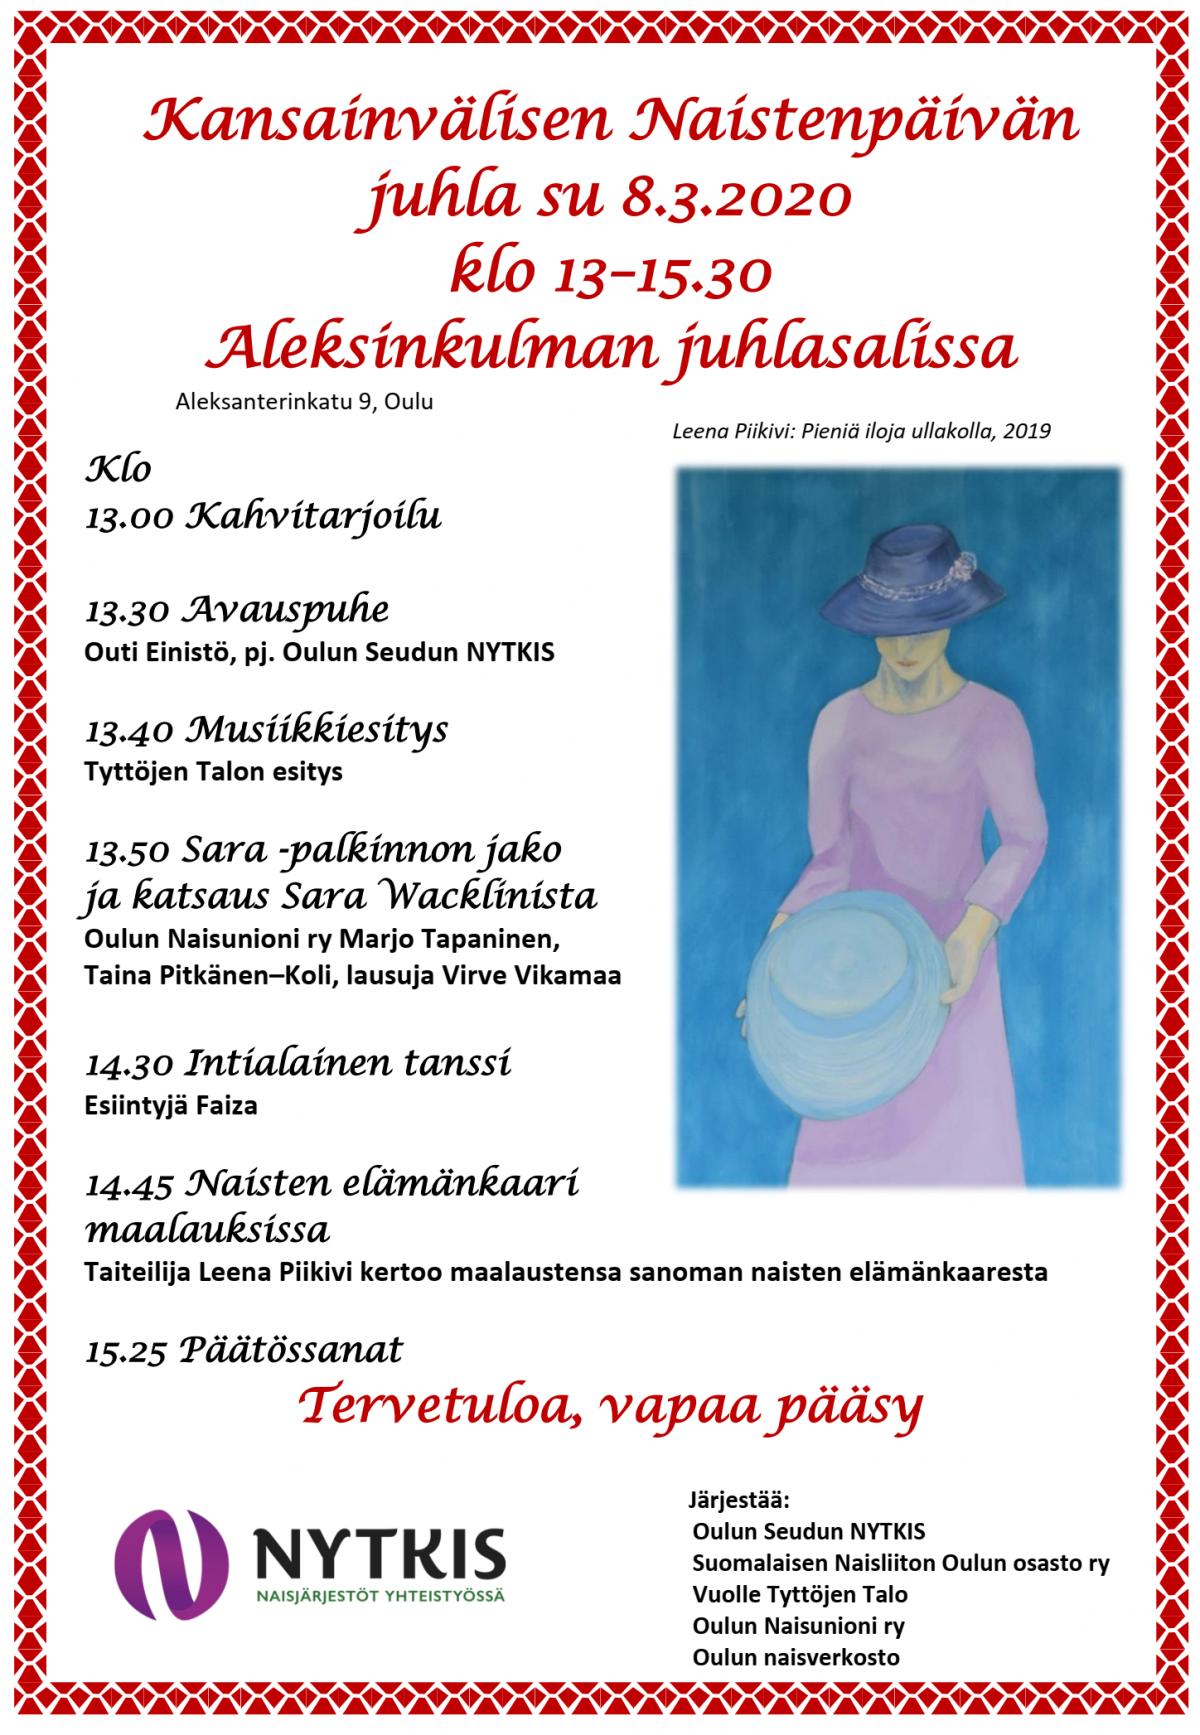 Naisten päivän juhla 8.3.2020 klo 13.00 -15.30